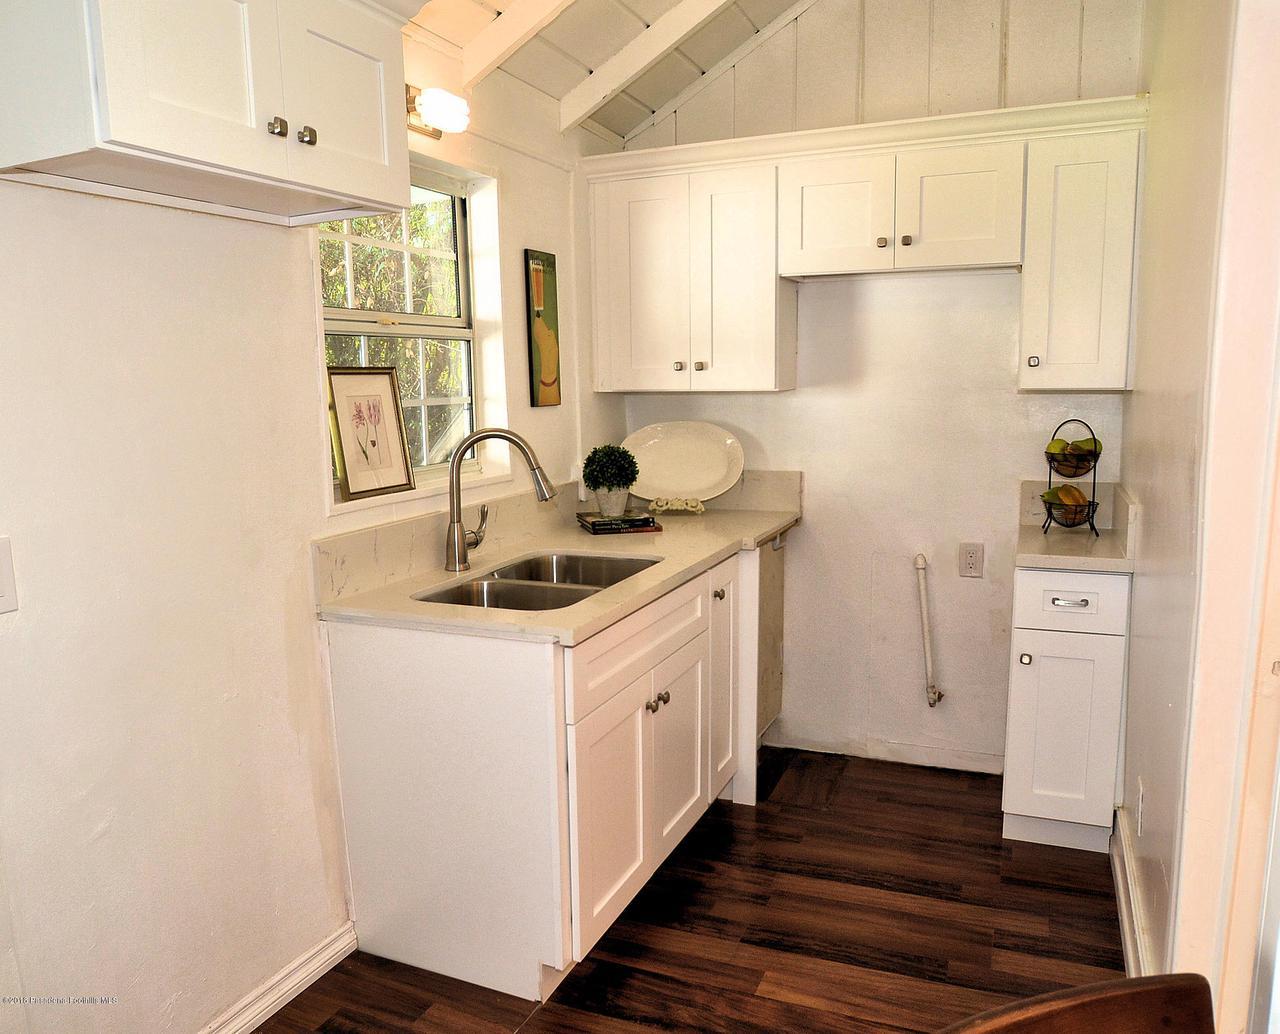 878 MORADA, Altadena, CA 91001 - 888 kitchen